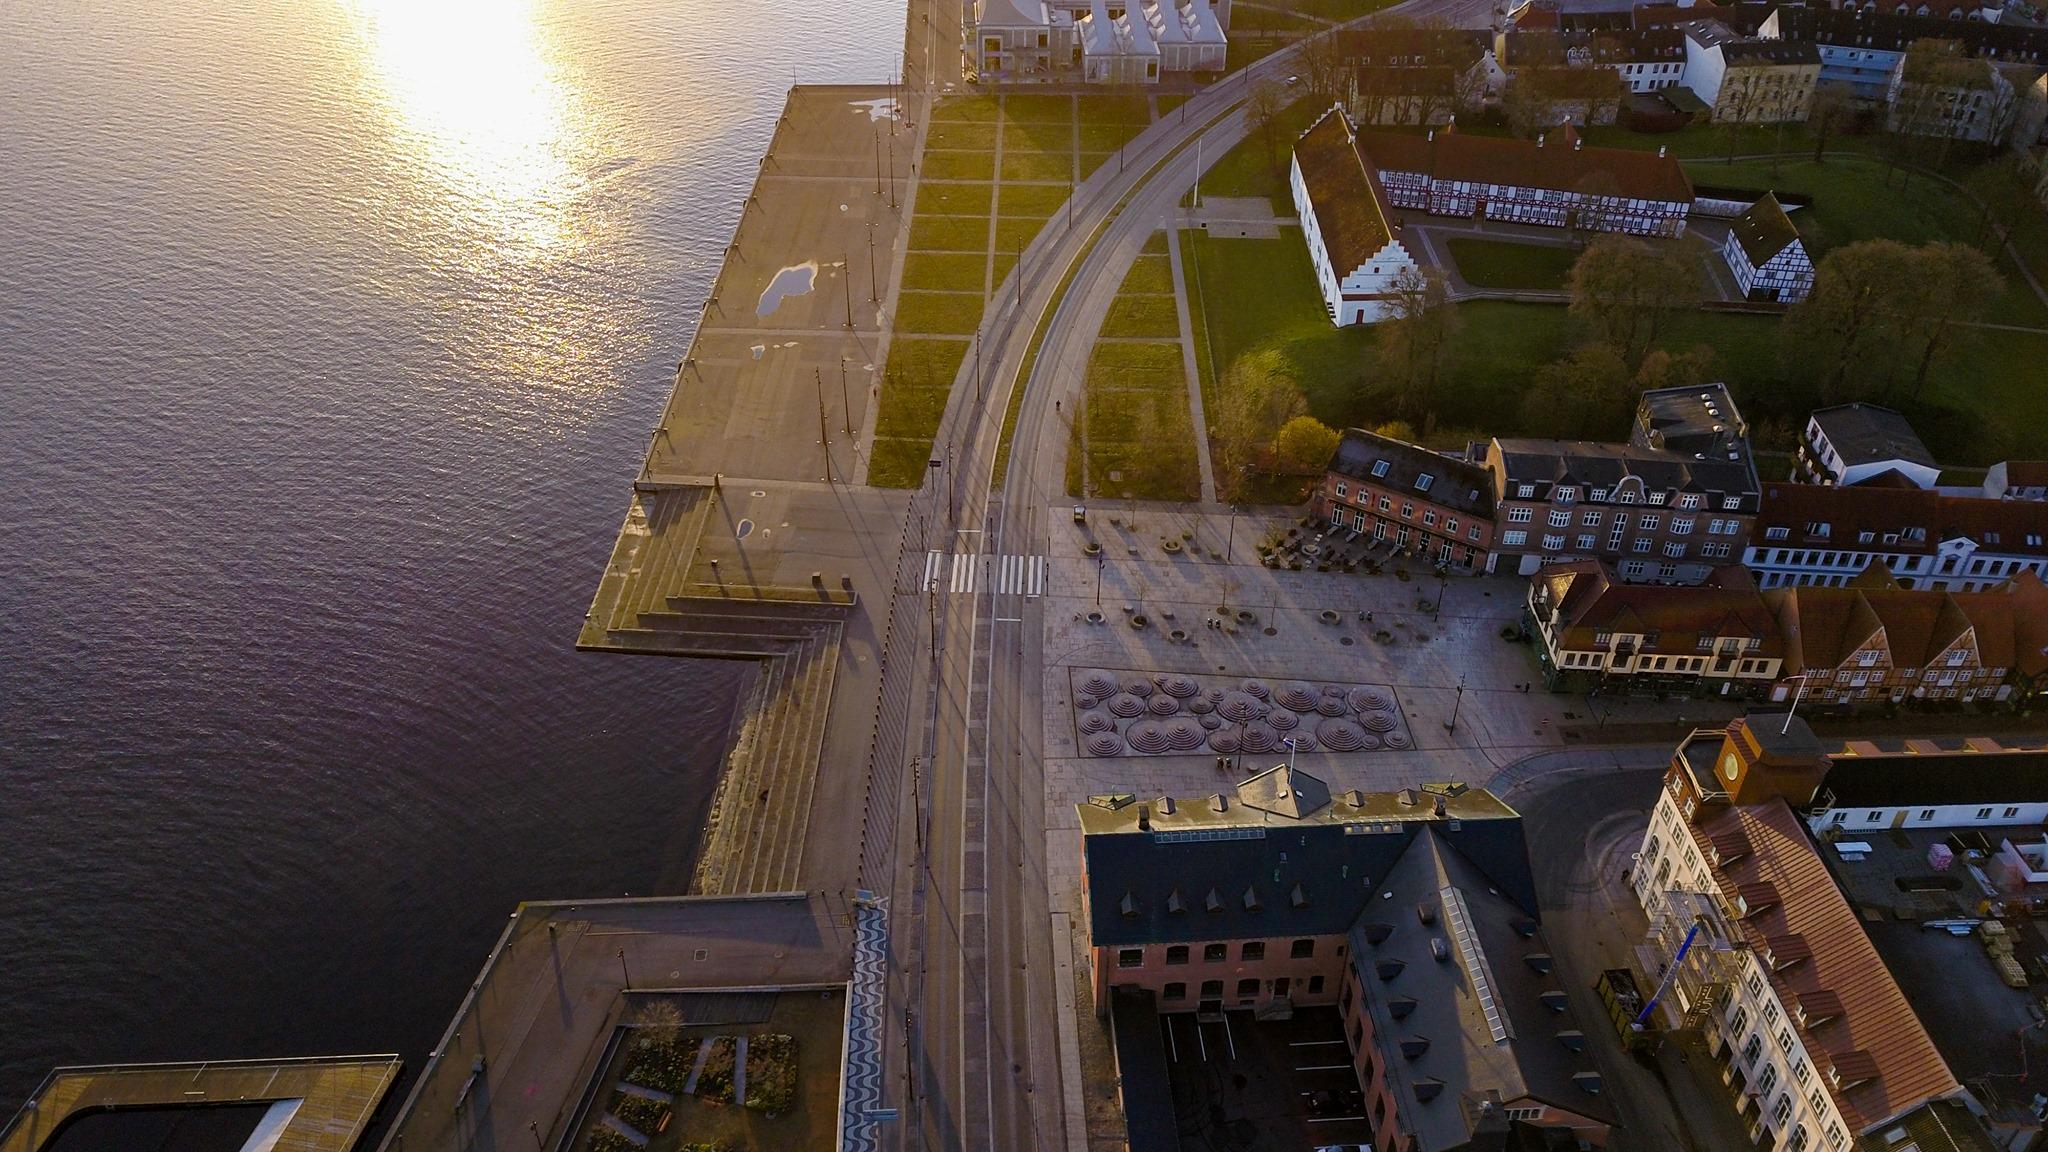 Borgmester og brancher i fælles appel: Så hårdt vil nedlukning ramme i Aalborg